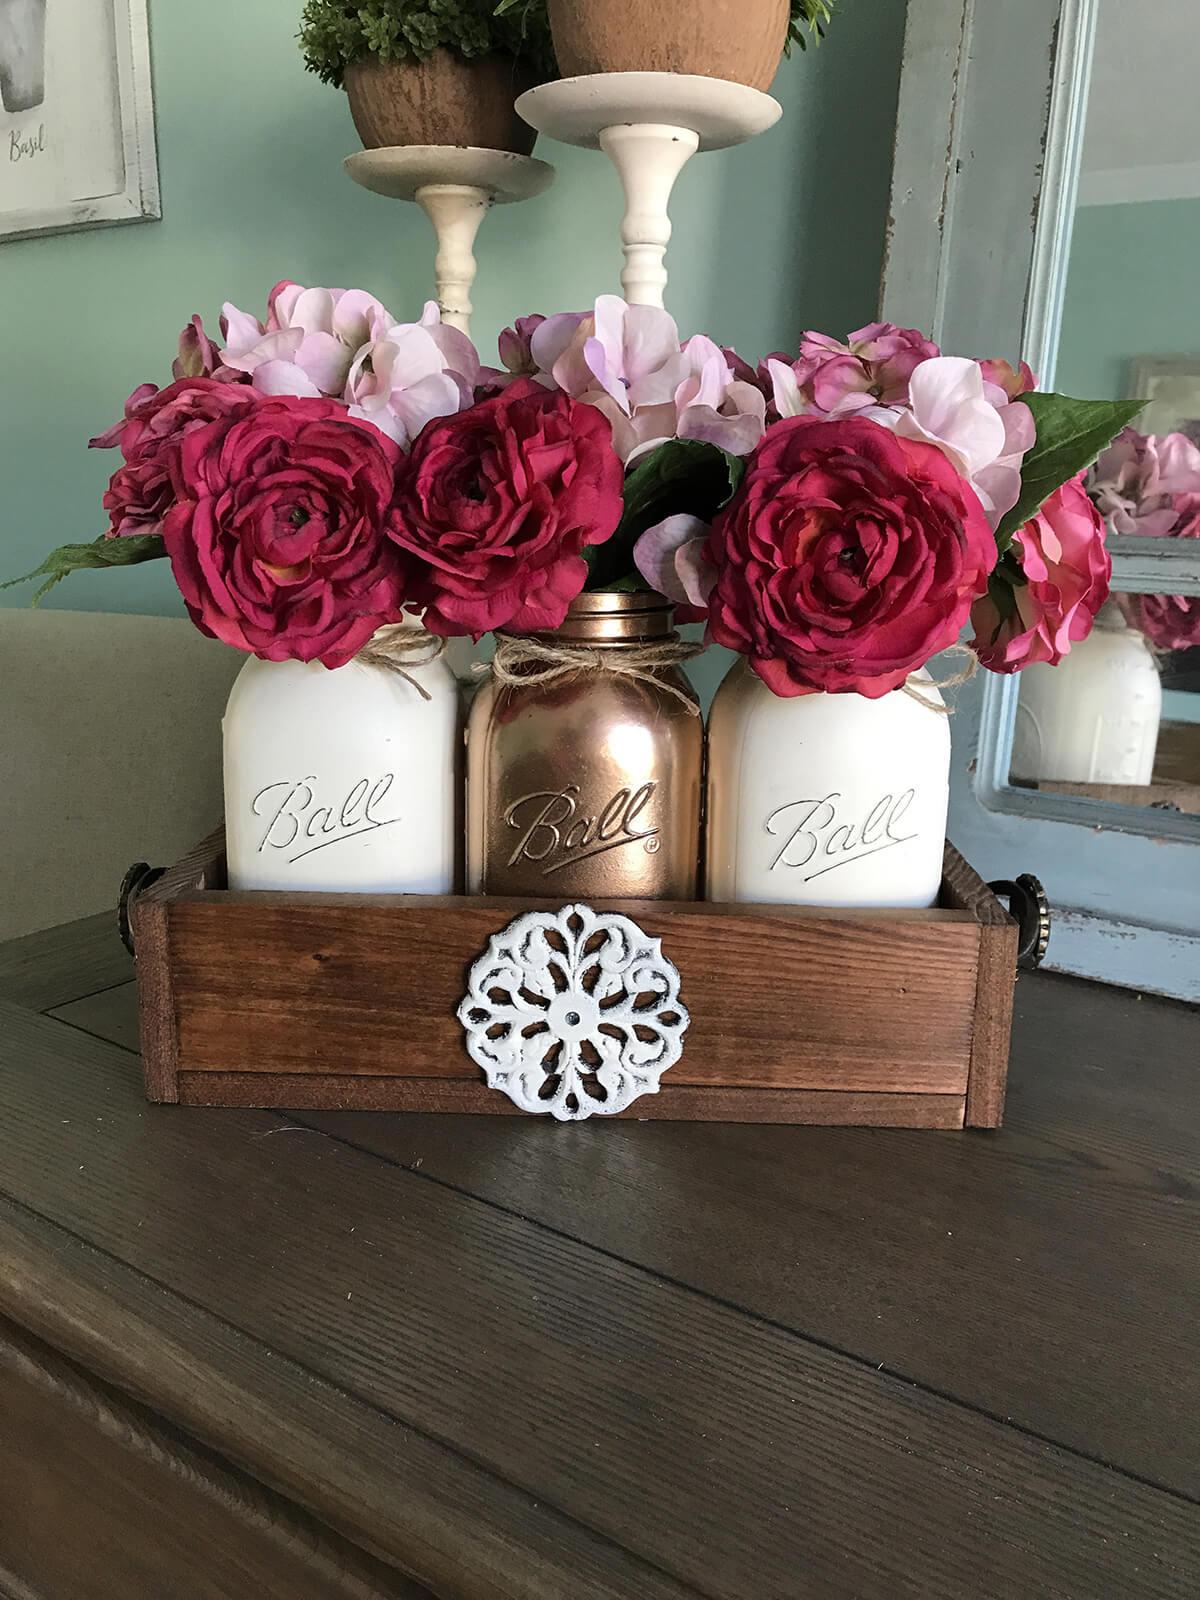 Vibrant Flowers Complete Your Decor